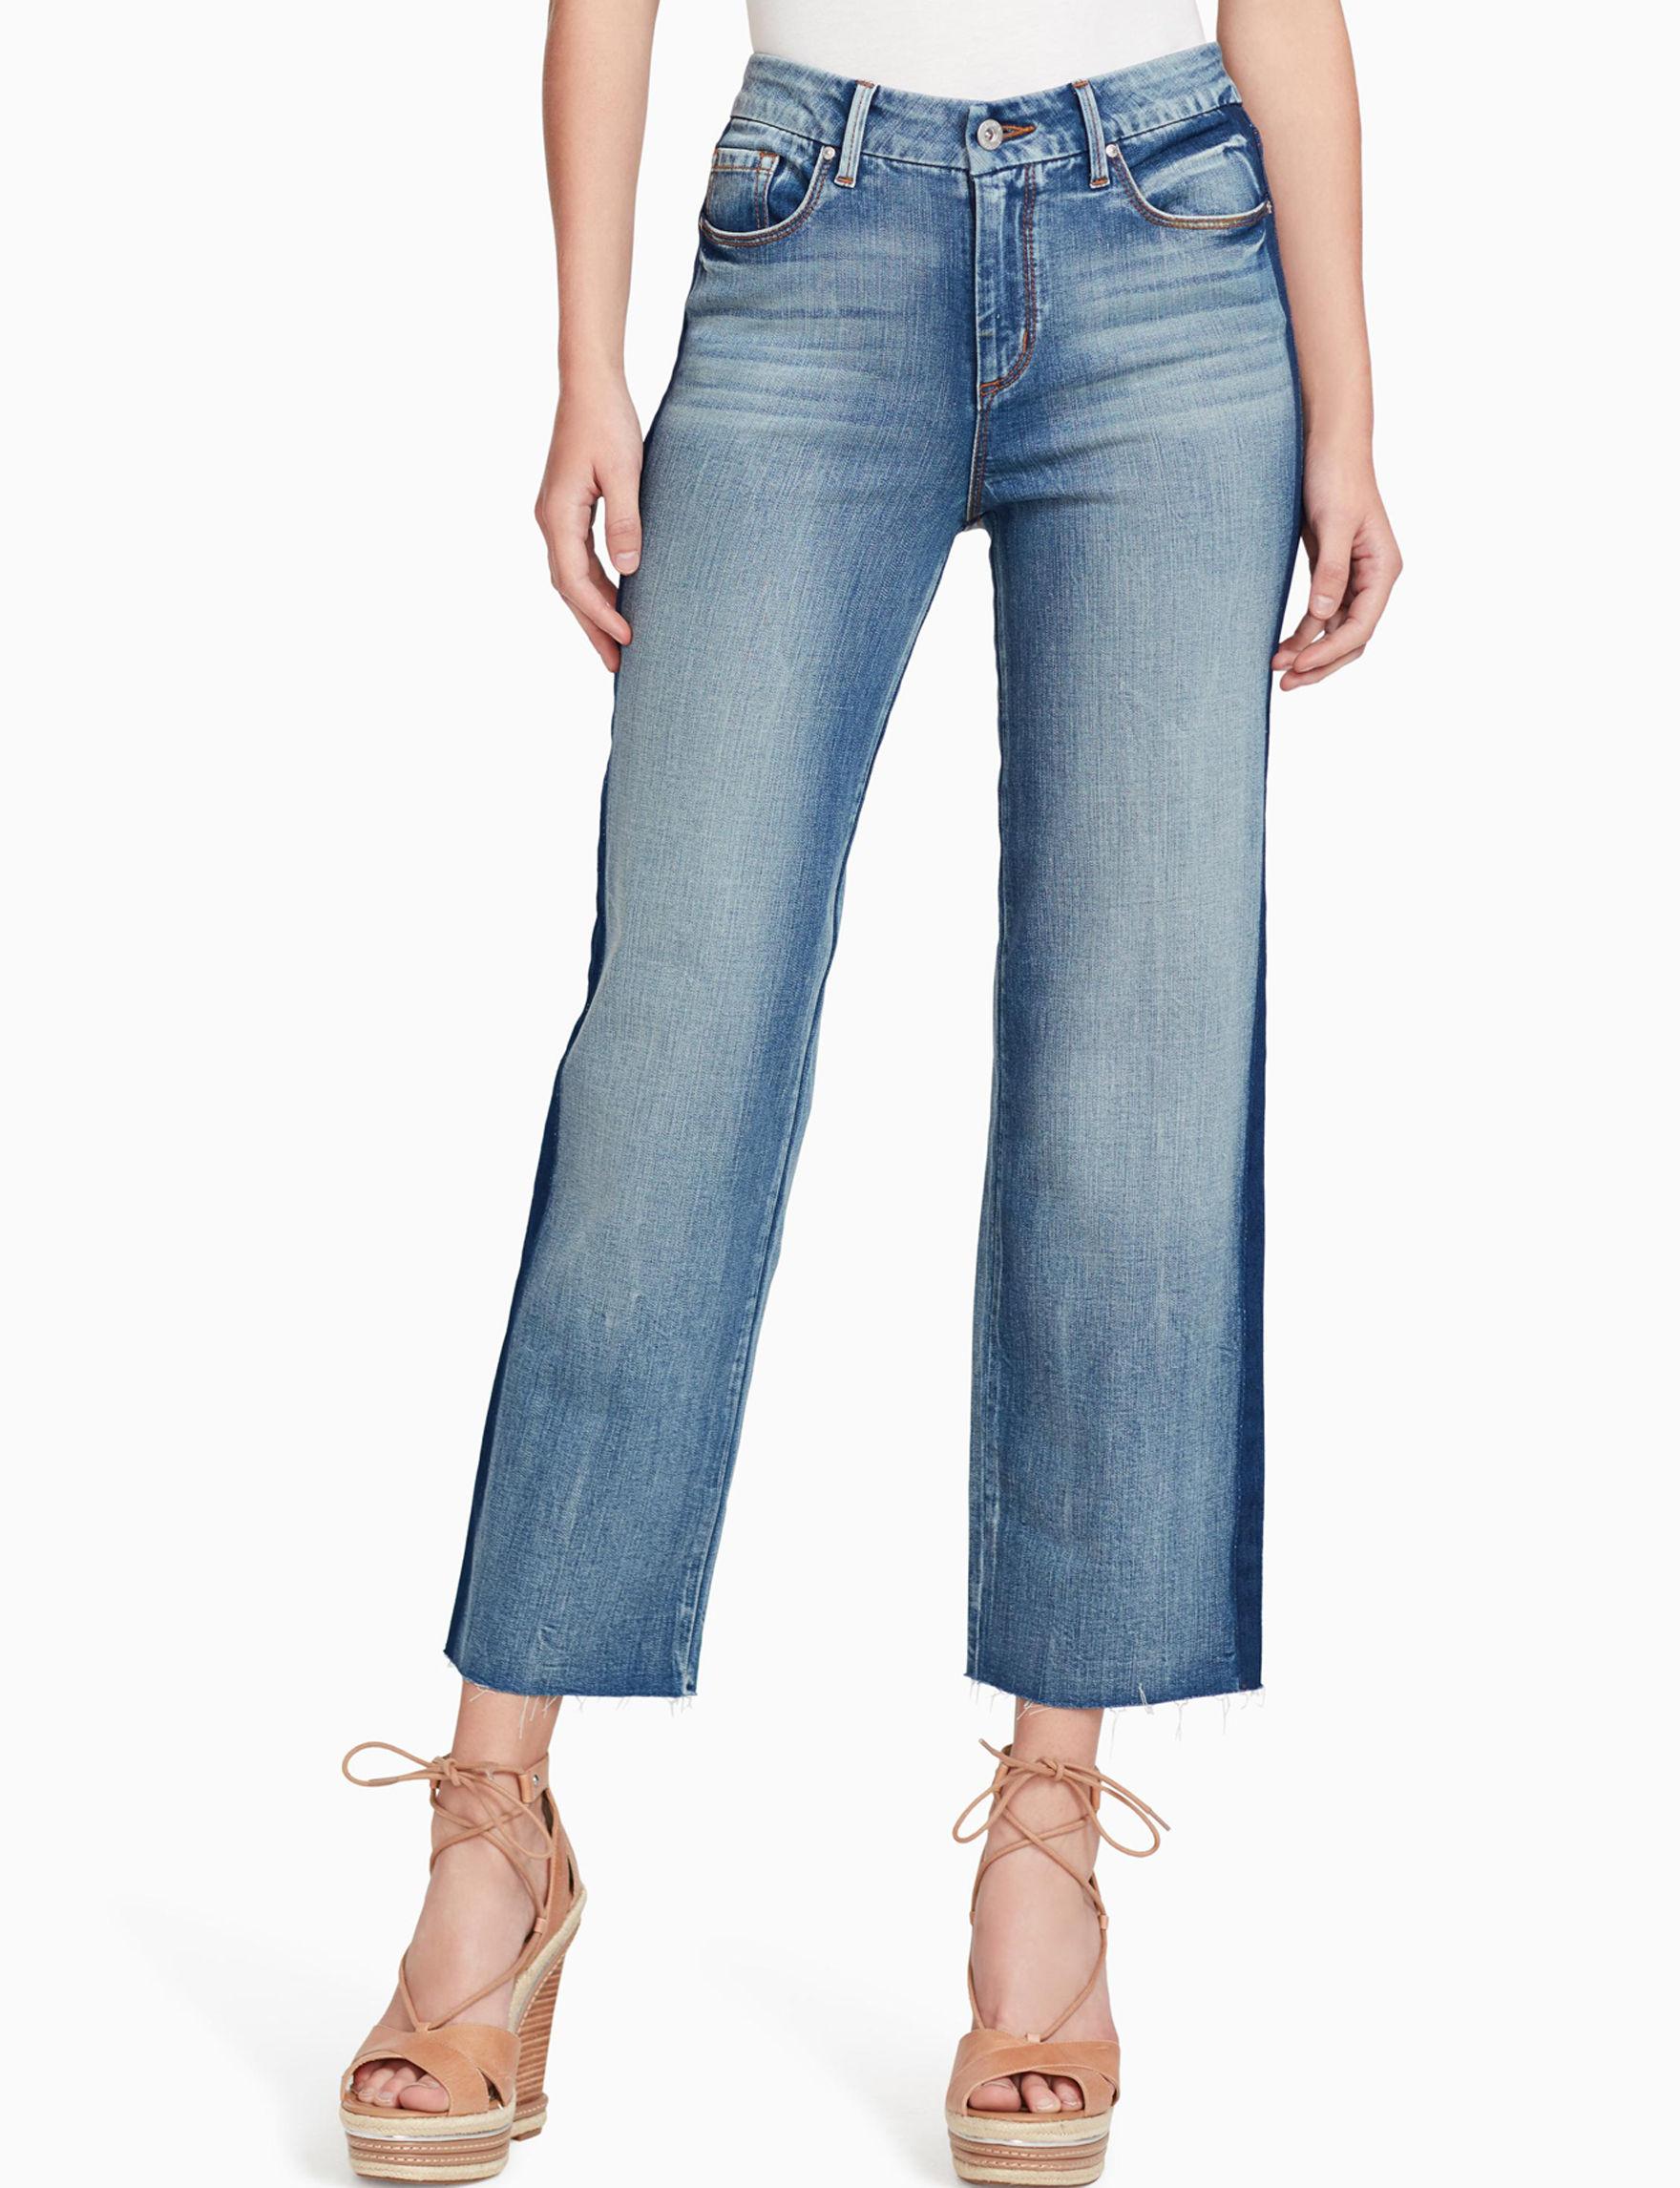 Jessica Simpson Blue Capris & Crops